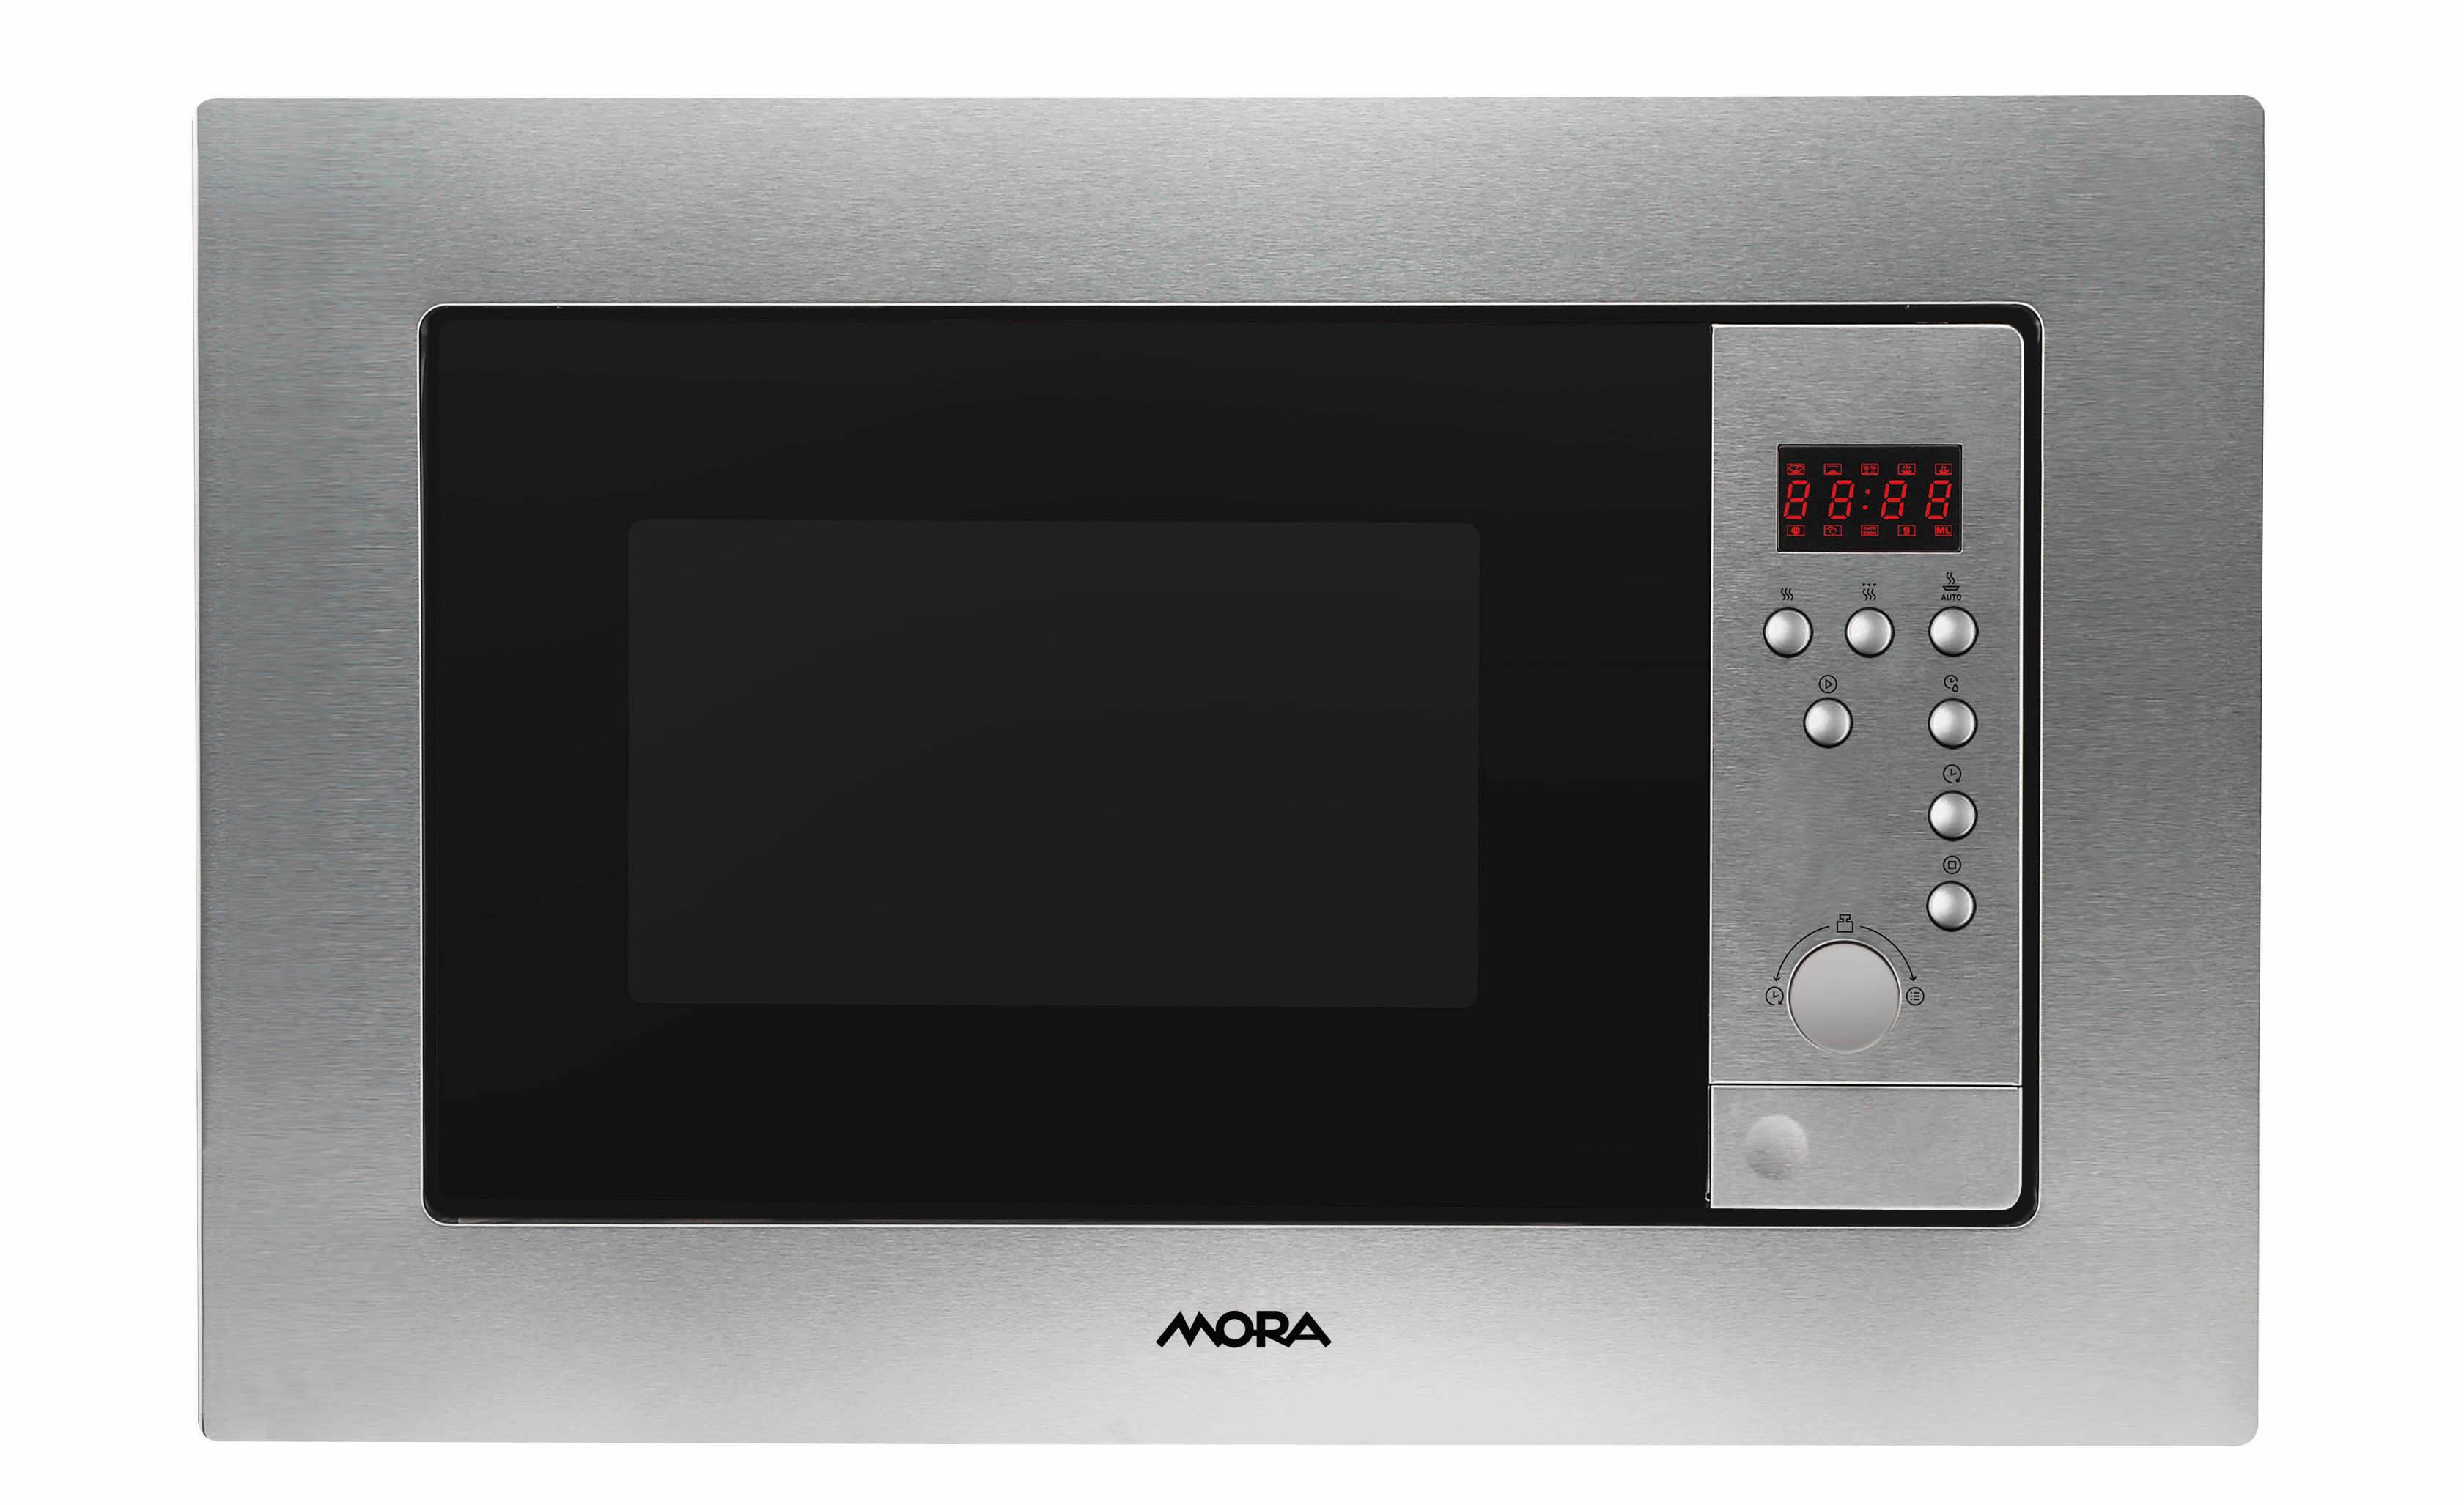 MORA VMT 441 X mikrovlnná trouba